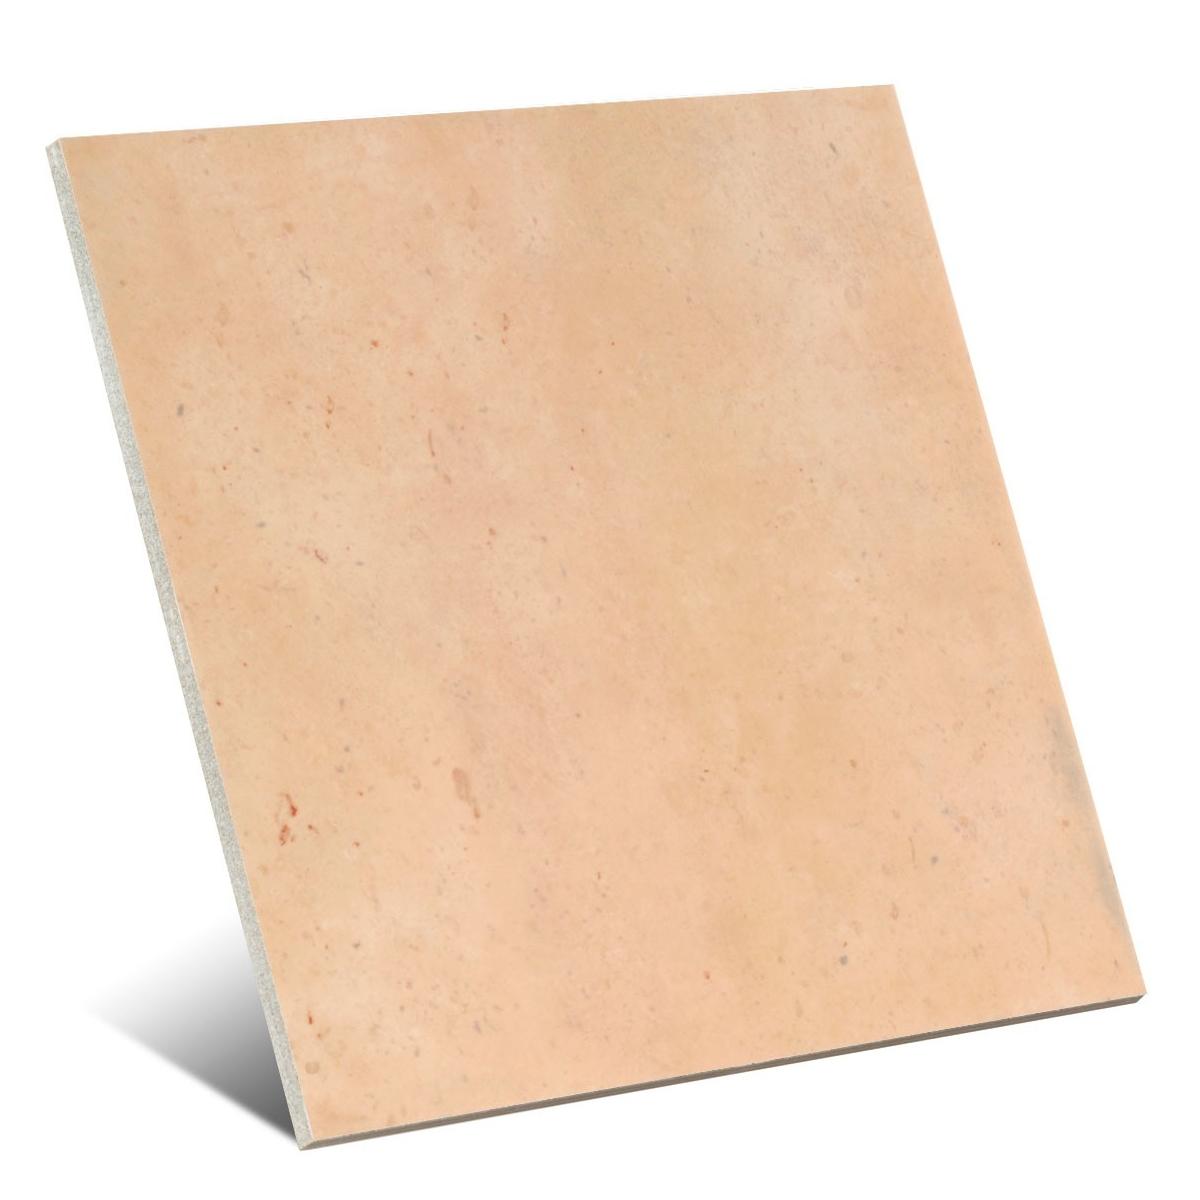 Barro Crema 20x20 (caja 1 m2)